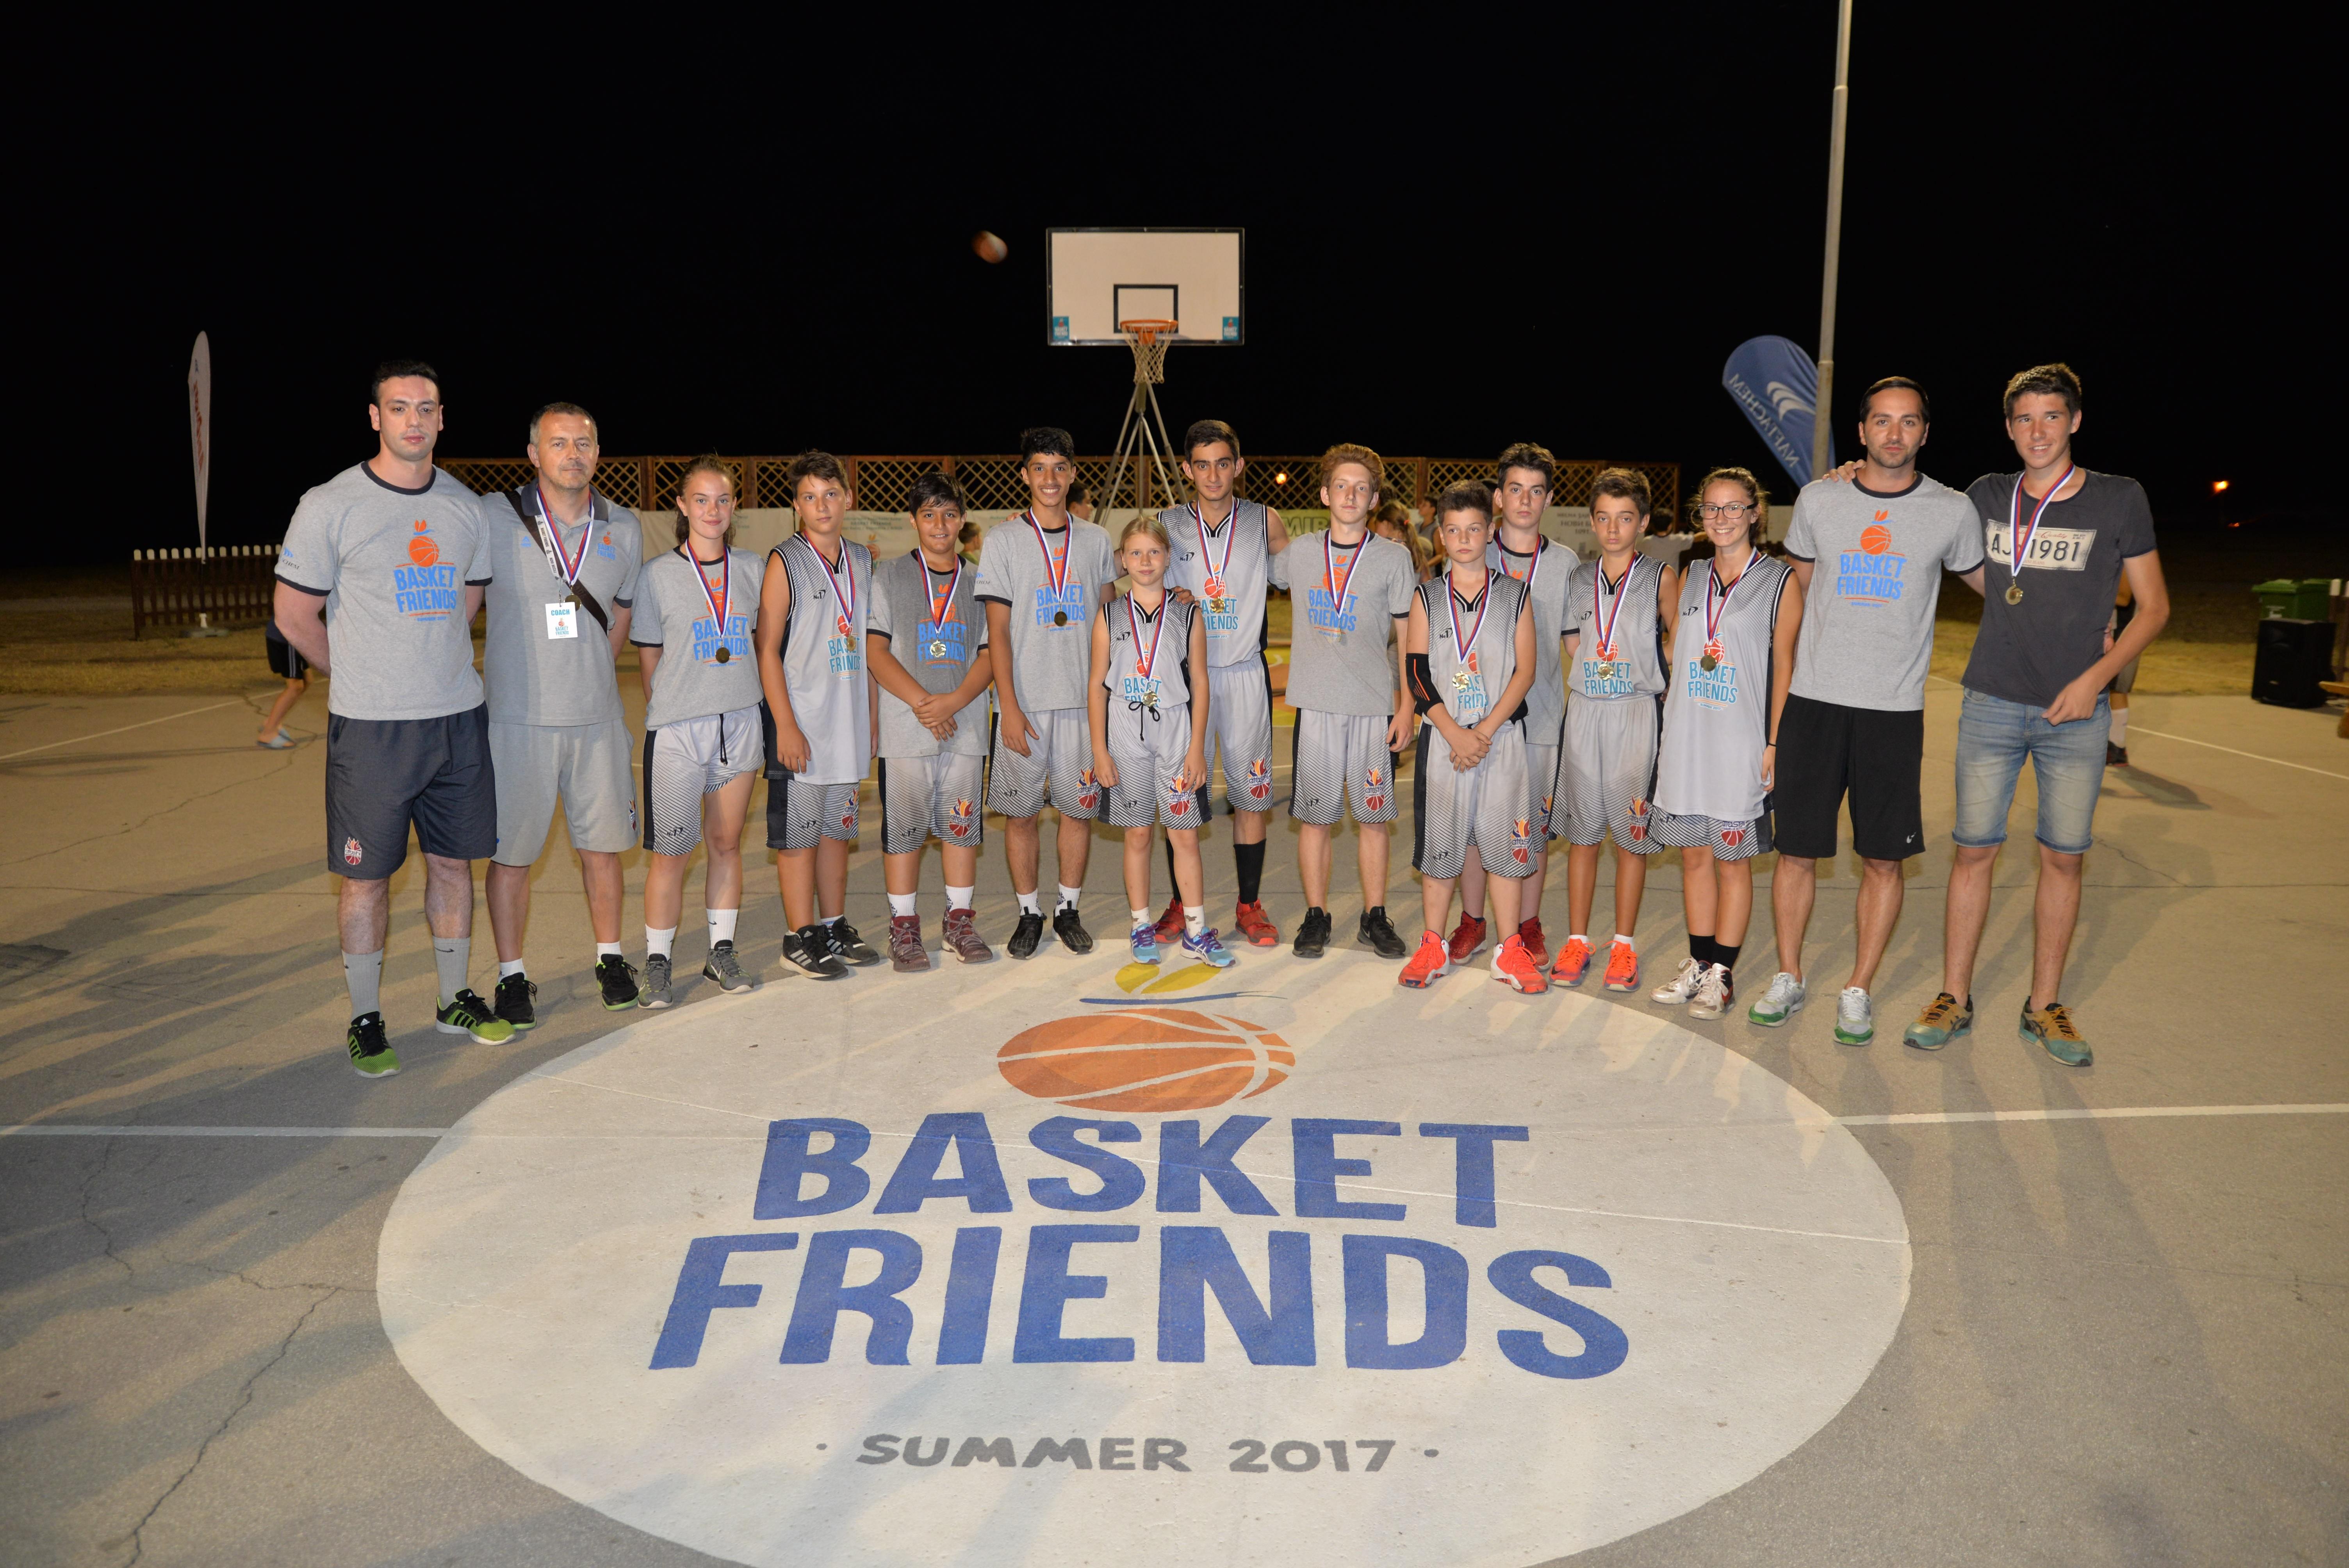 Basketfriends 2017. - pobednička ekipa u igri 5 na 5